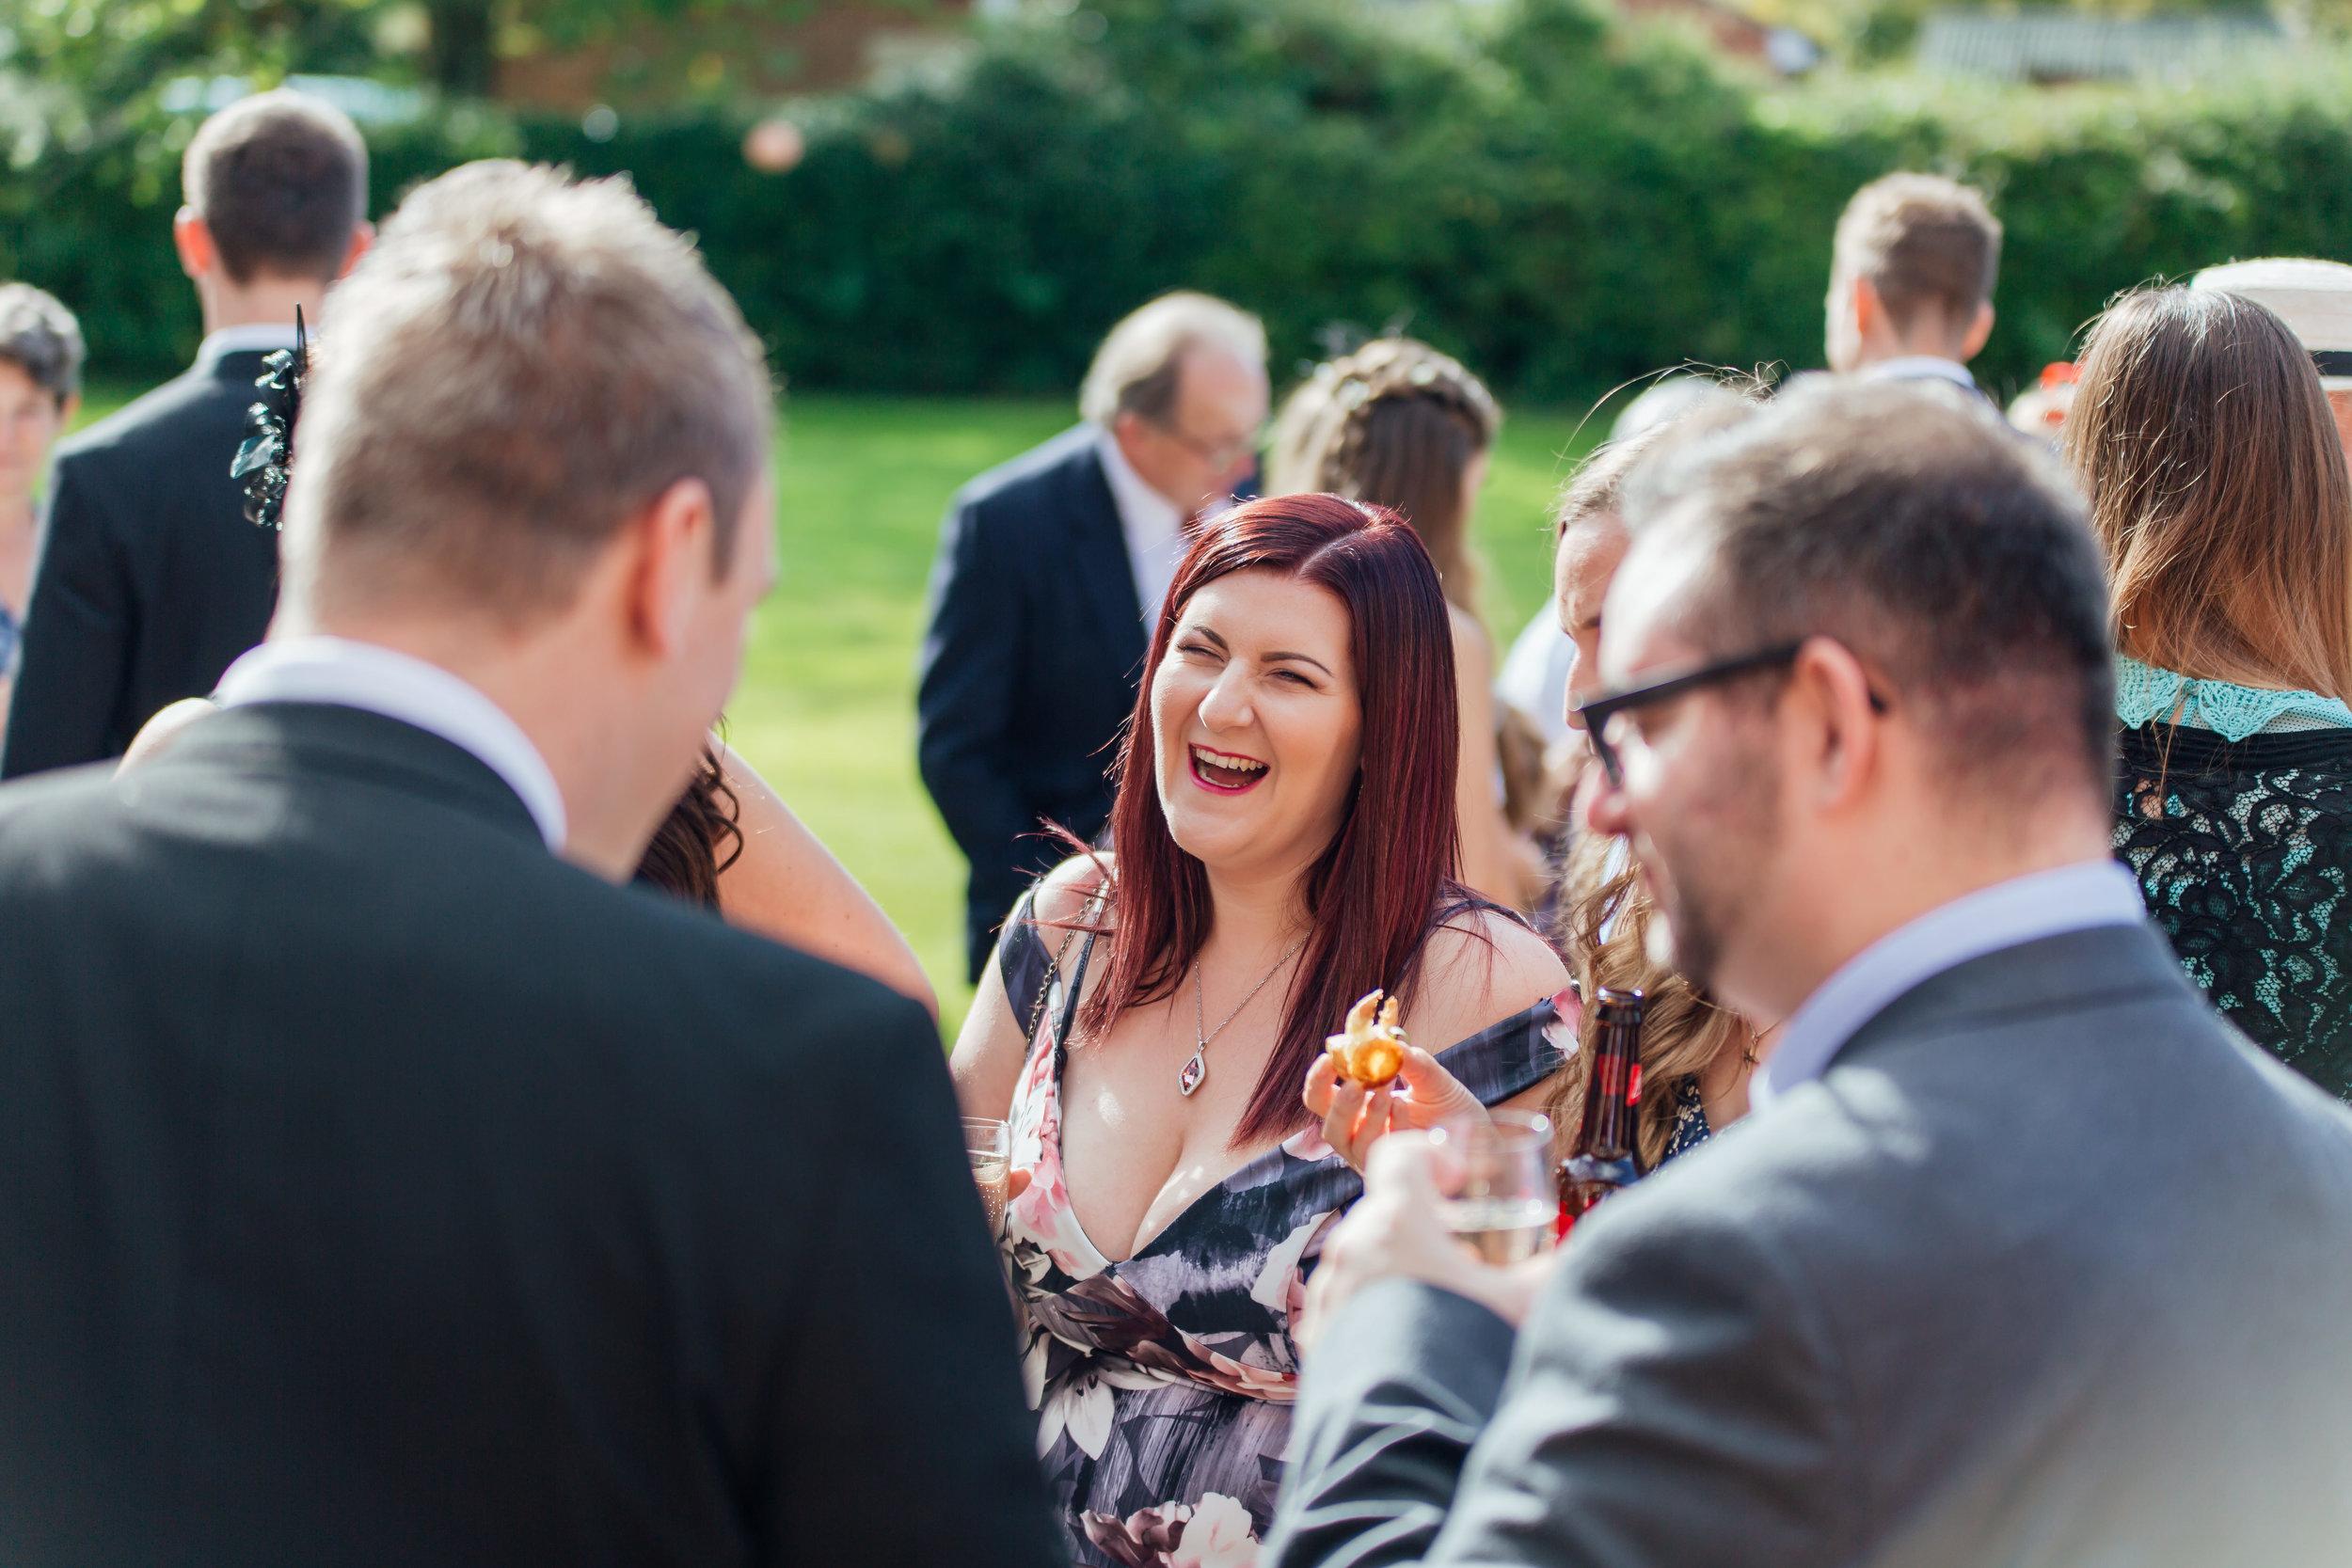 New Forest Village Hall Wedding / Sarah-Fishlock-Photography / Hampshire-Wedding-Photographer-Hampshire / diy-wedding-ideas